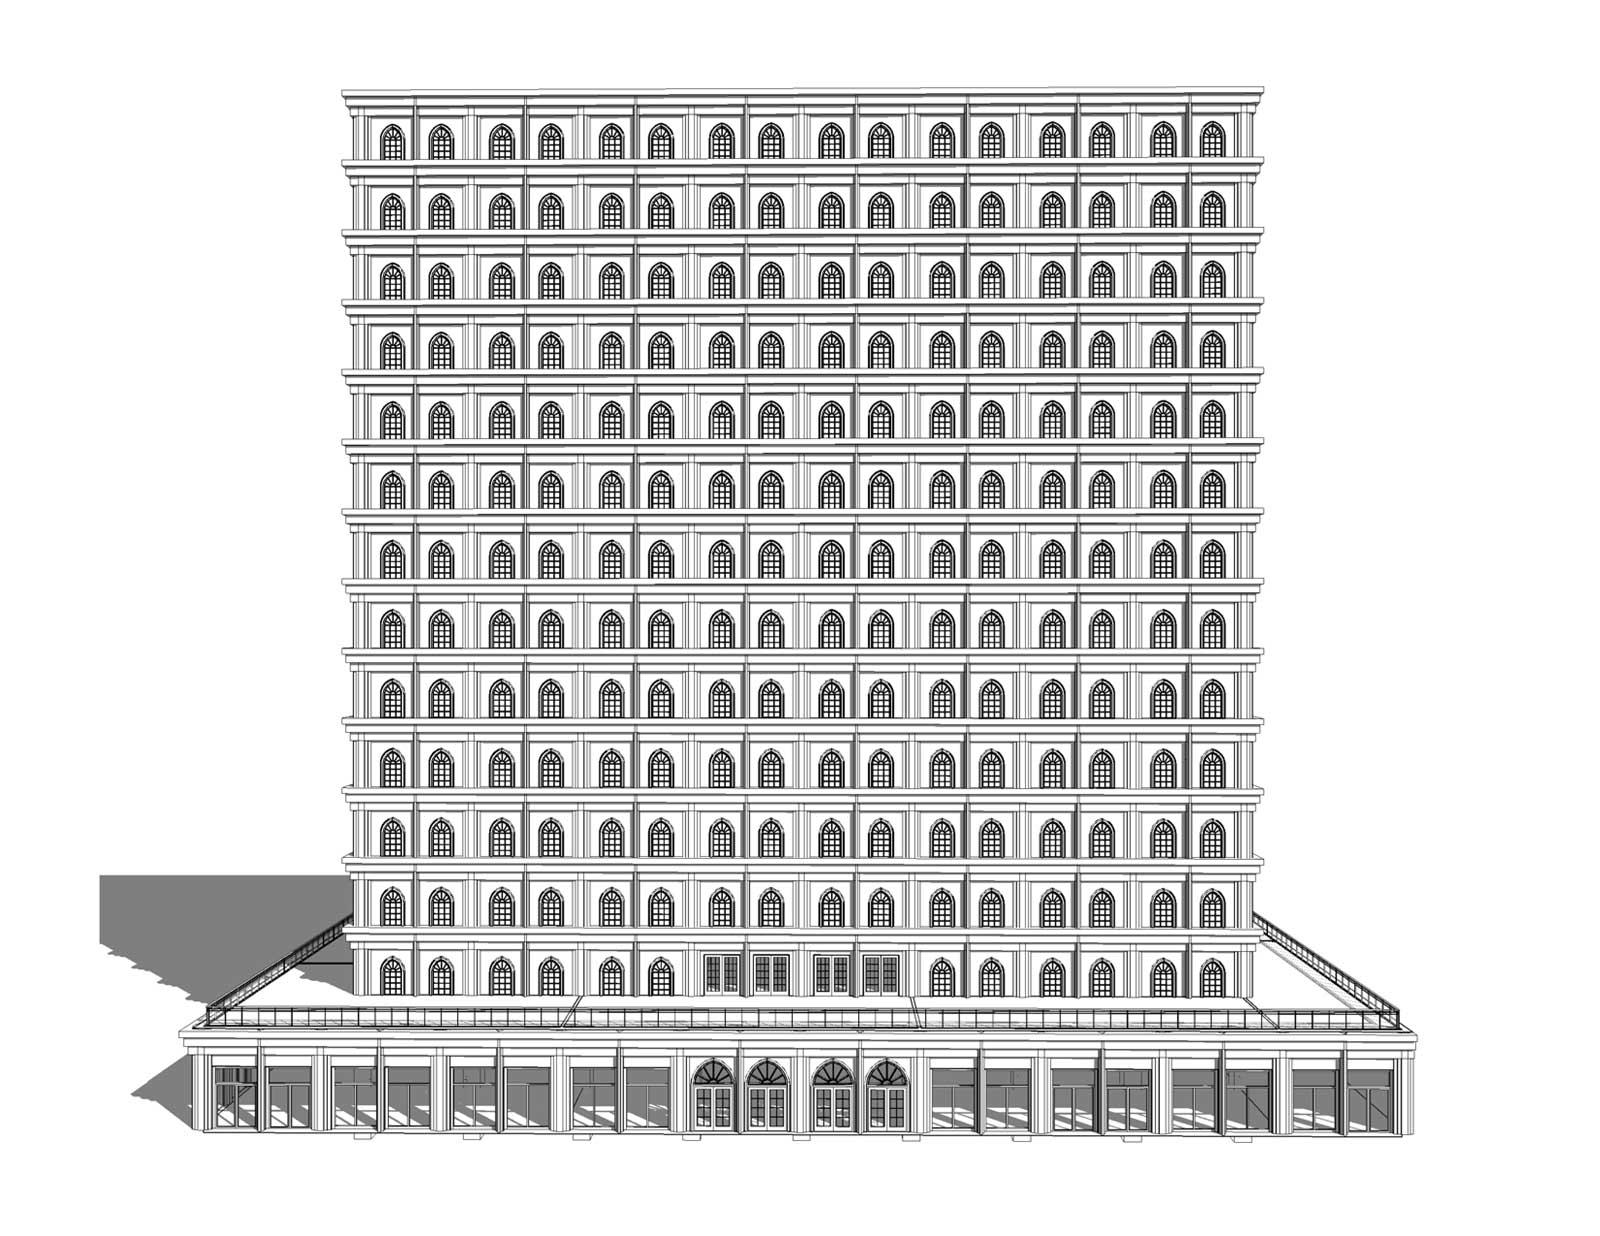 Sky Mausoleum Elevation